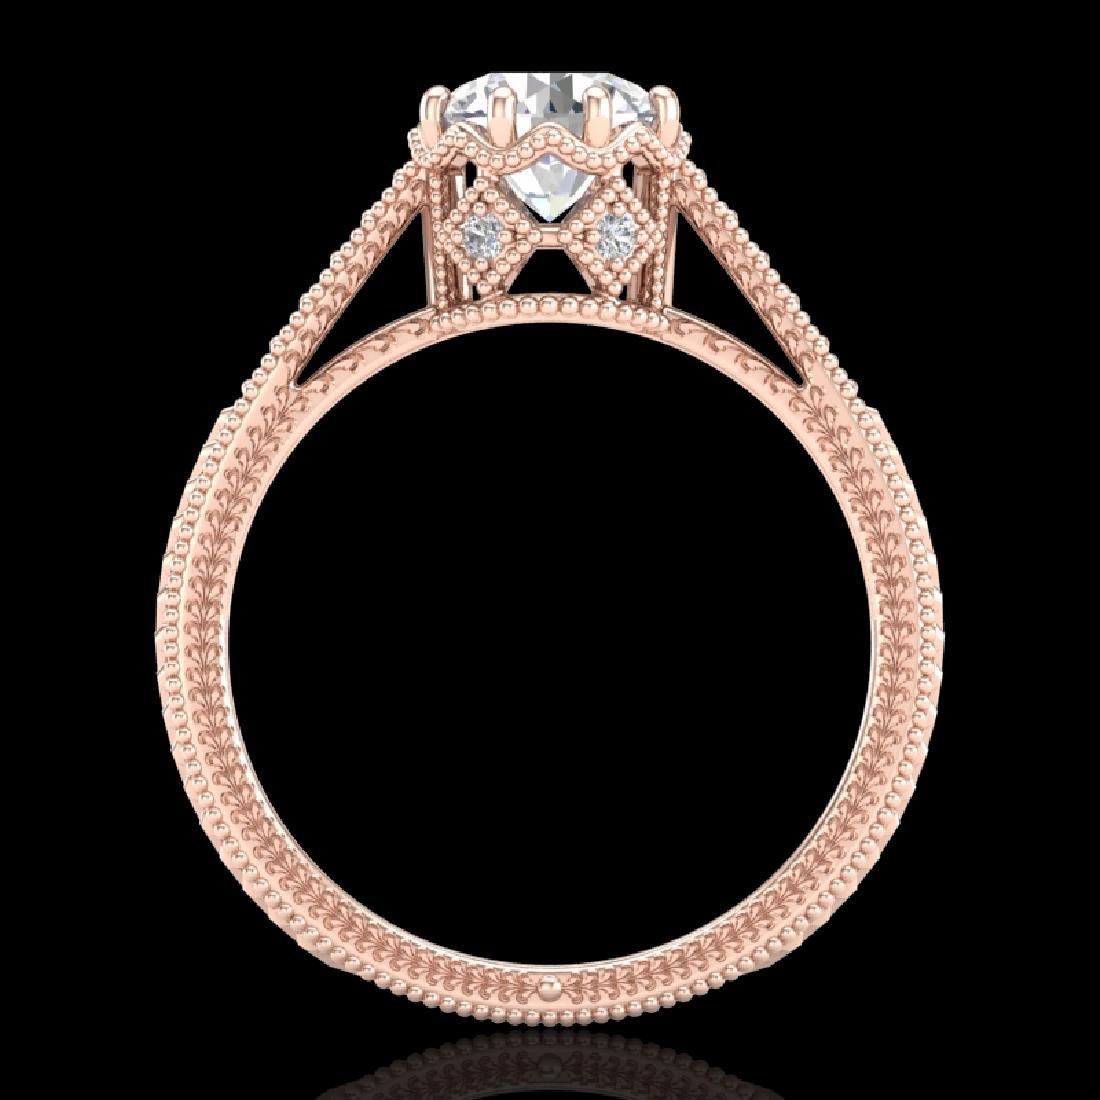 1.25 CTW VS/SI Diamond Solitaire Art Deco Ring 18K Rose